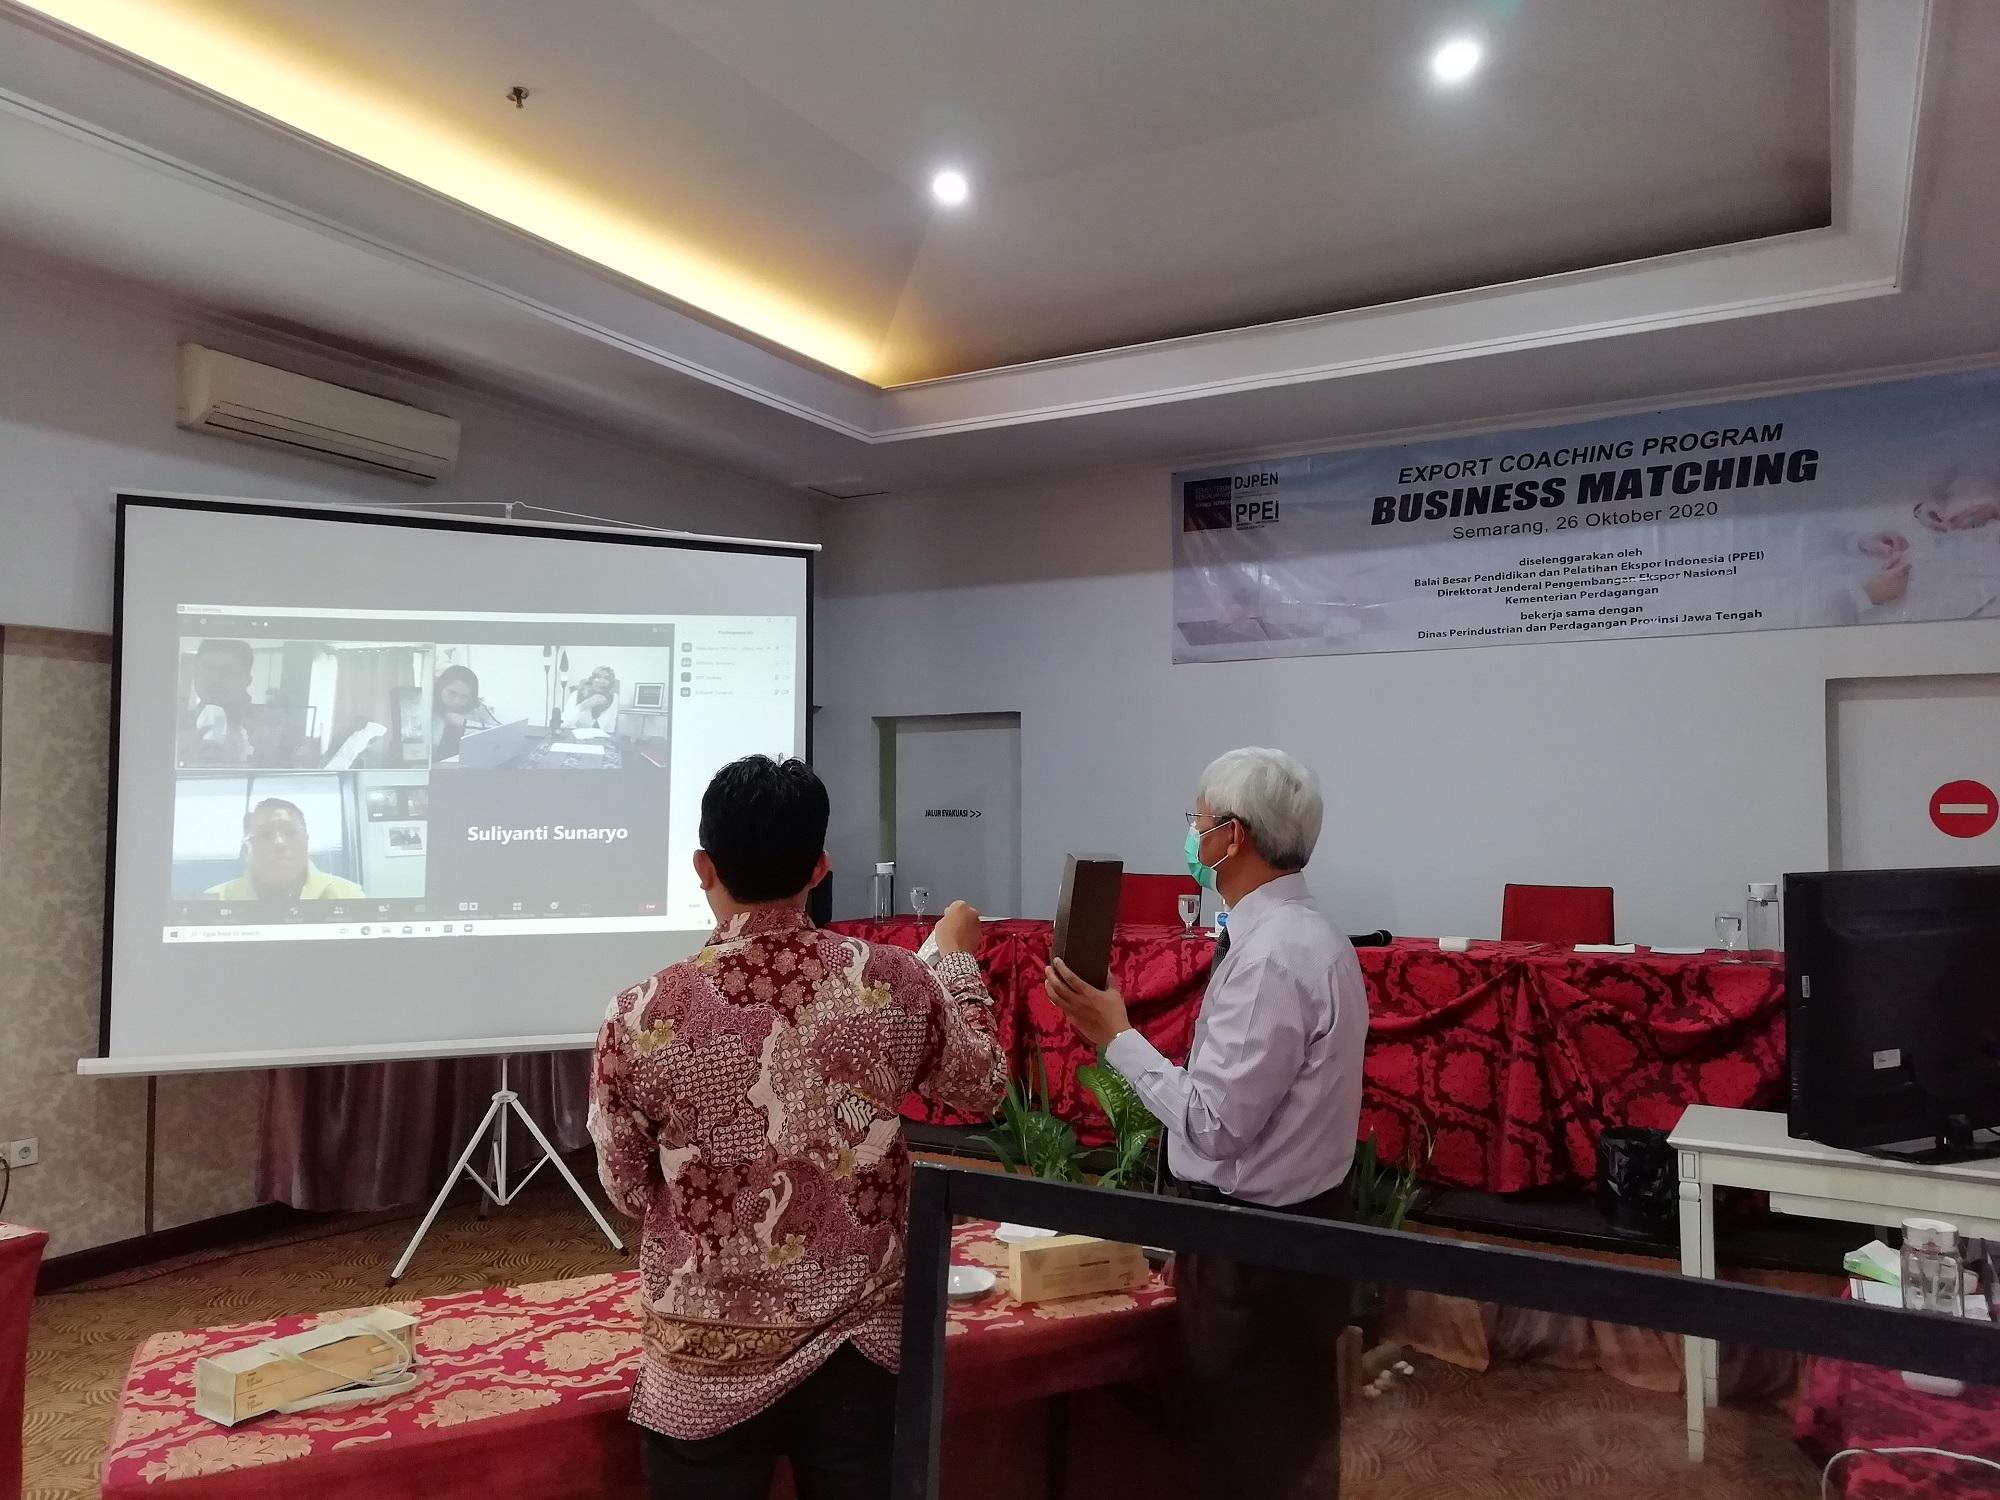 Balai Besar PPEI Menyelenggarakan Business Matching pada Export Coaching Program wilayah Jawa Tengah dan Banyuwangi